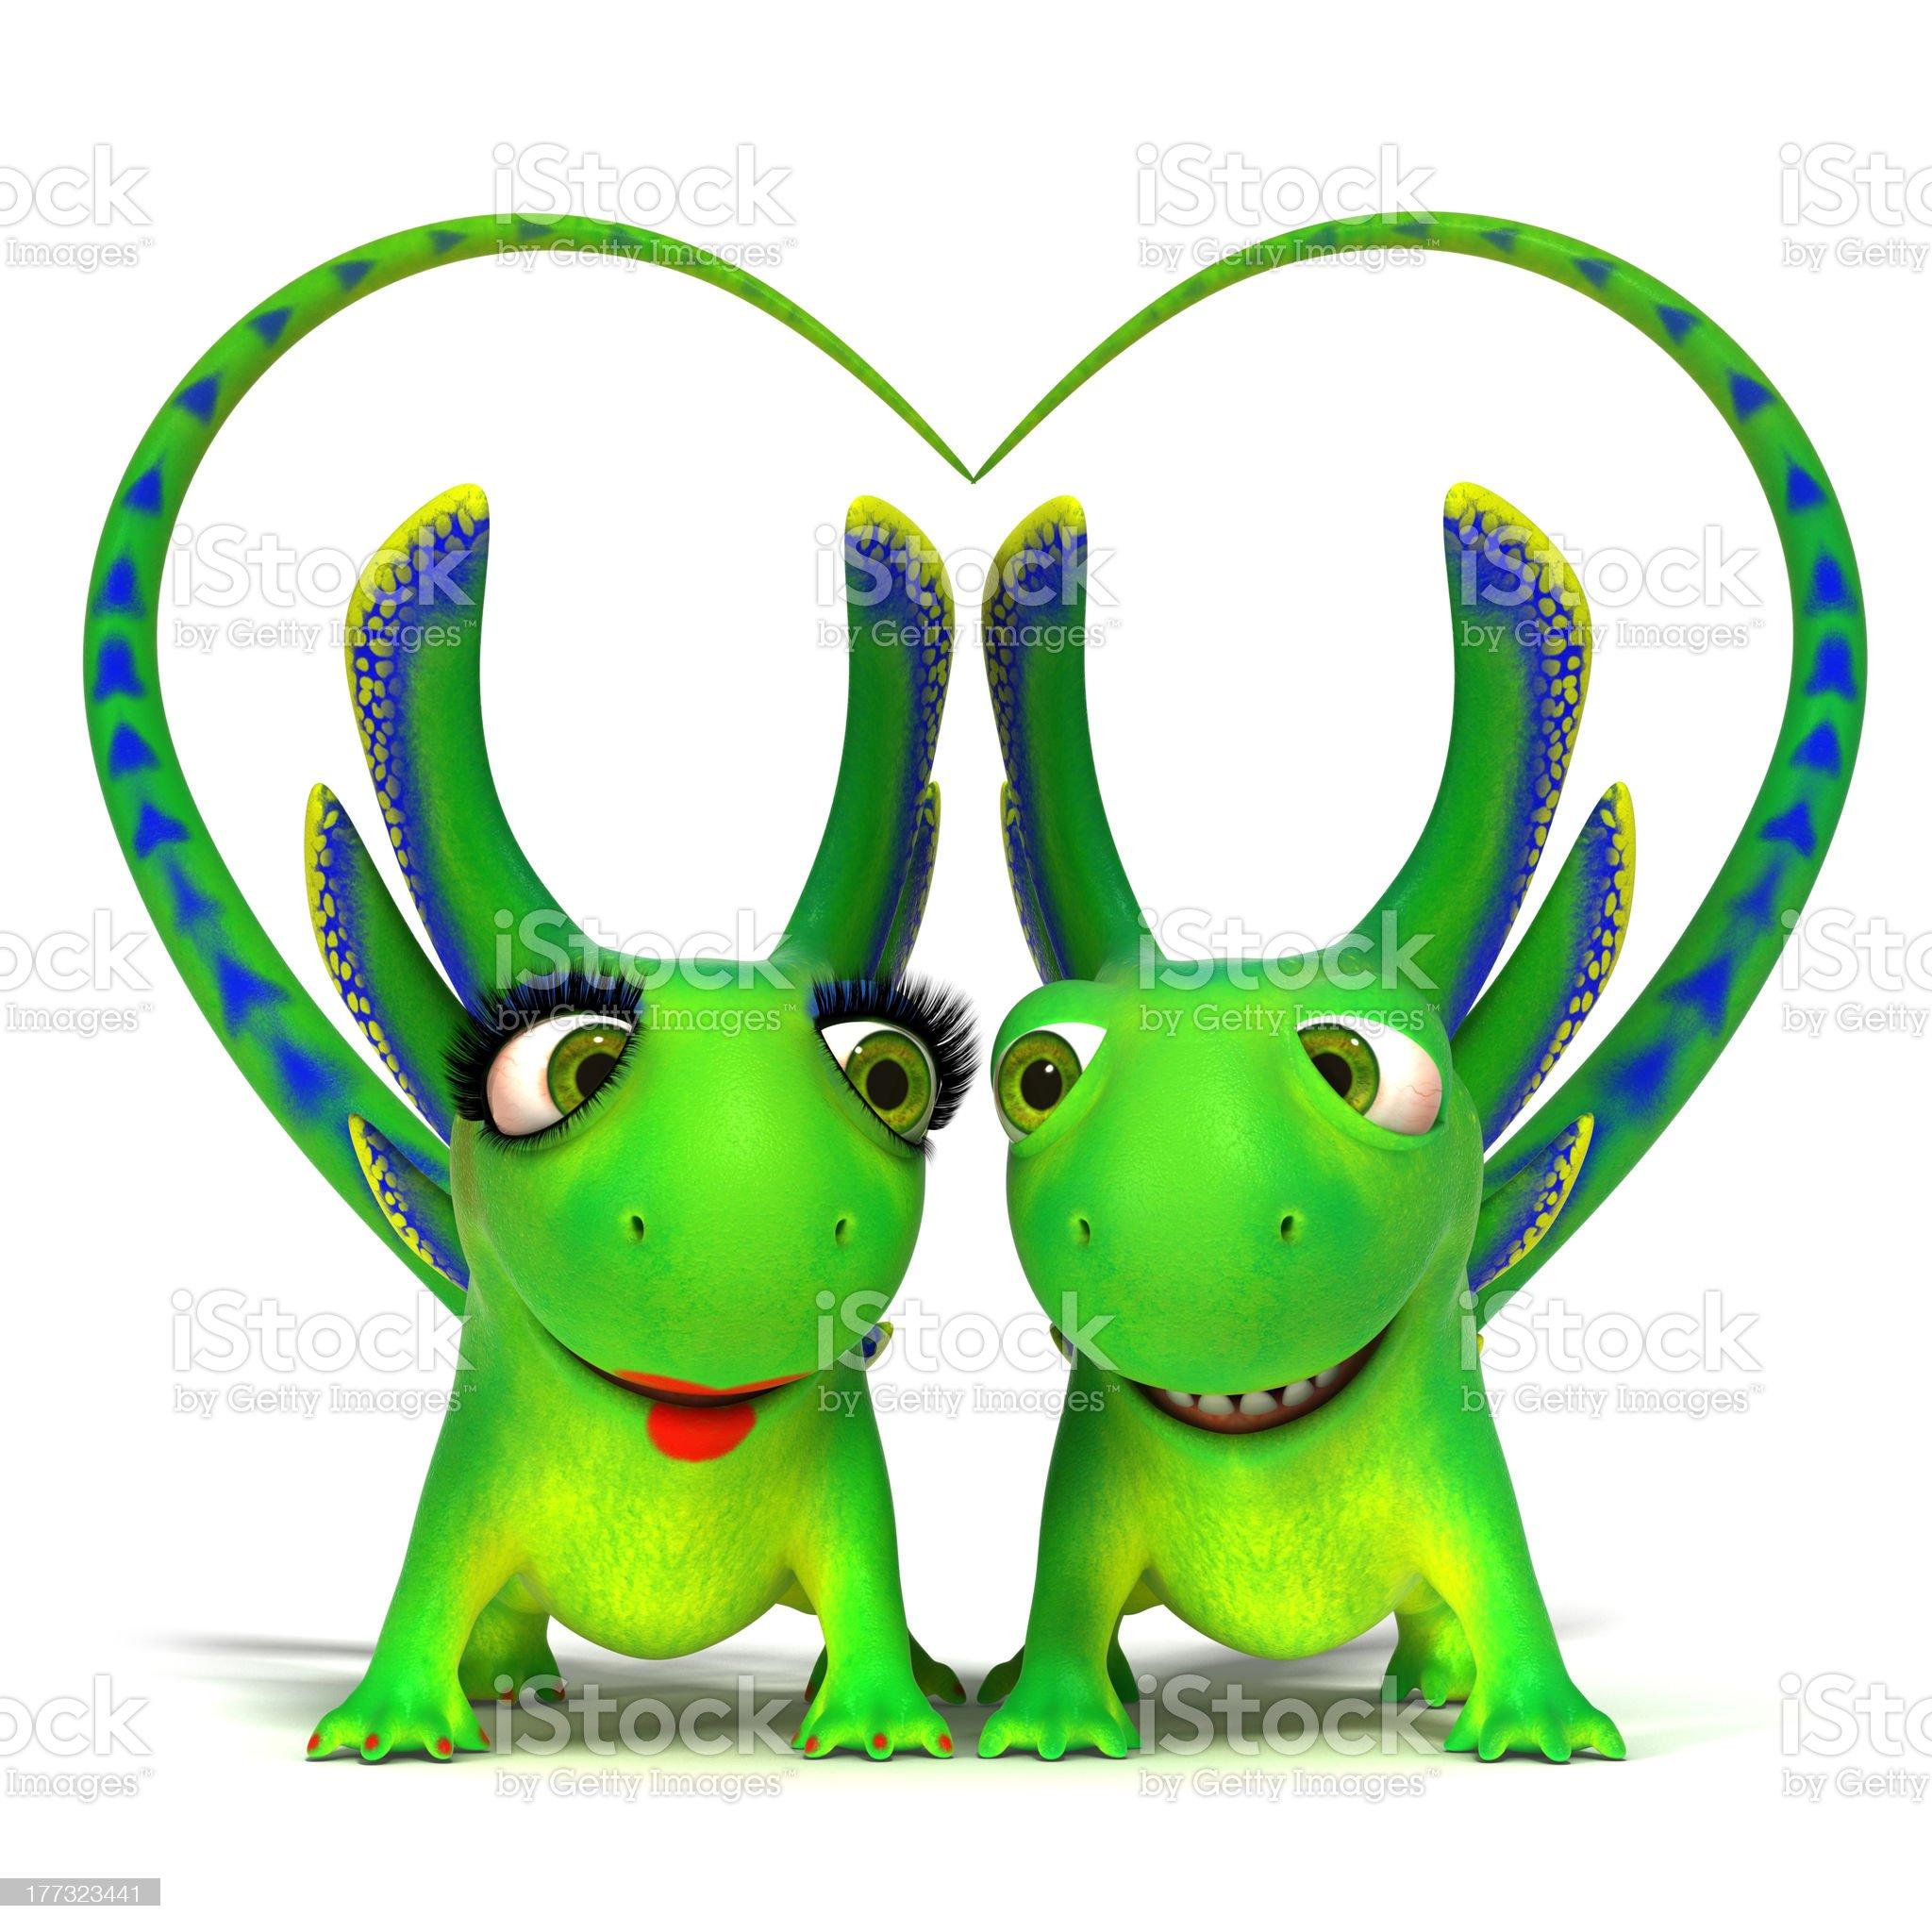 Enamoured lizards royalty-free stock photo